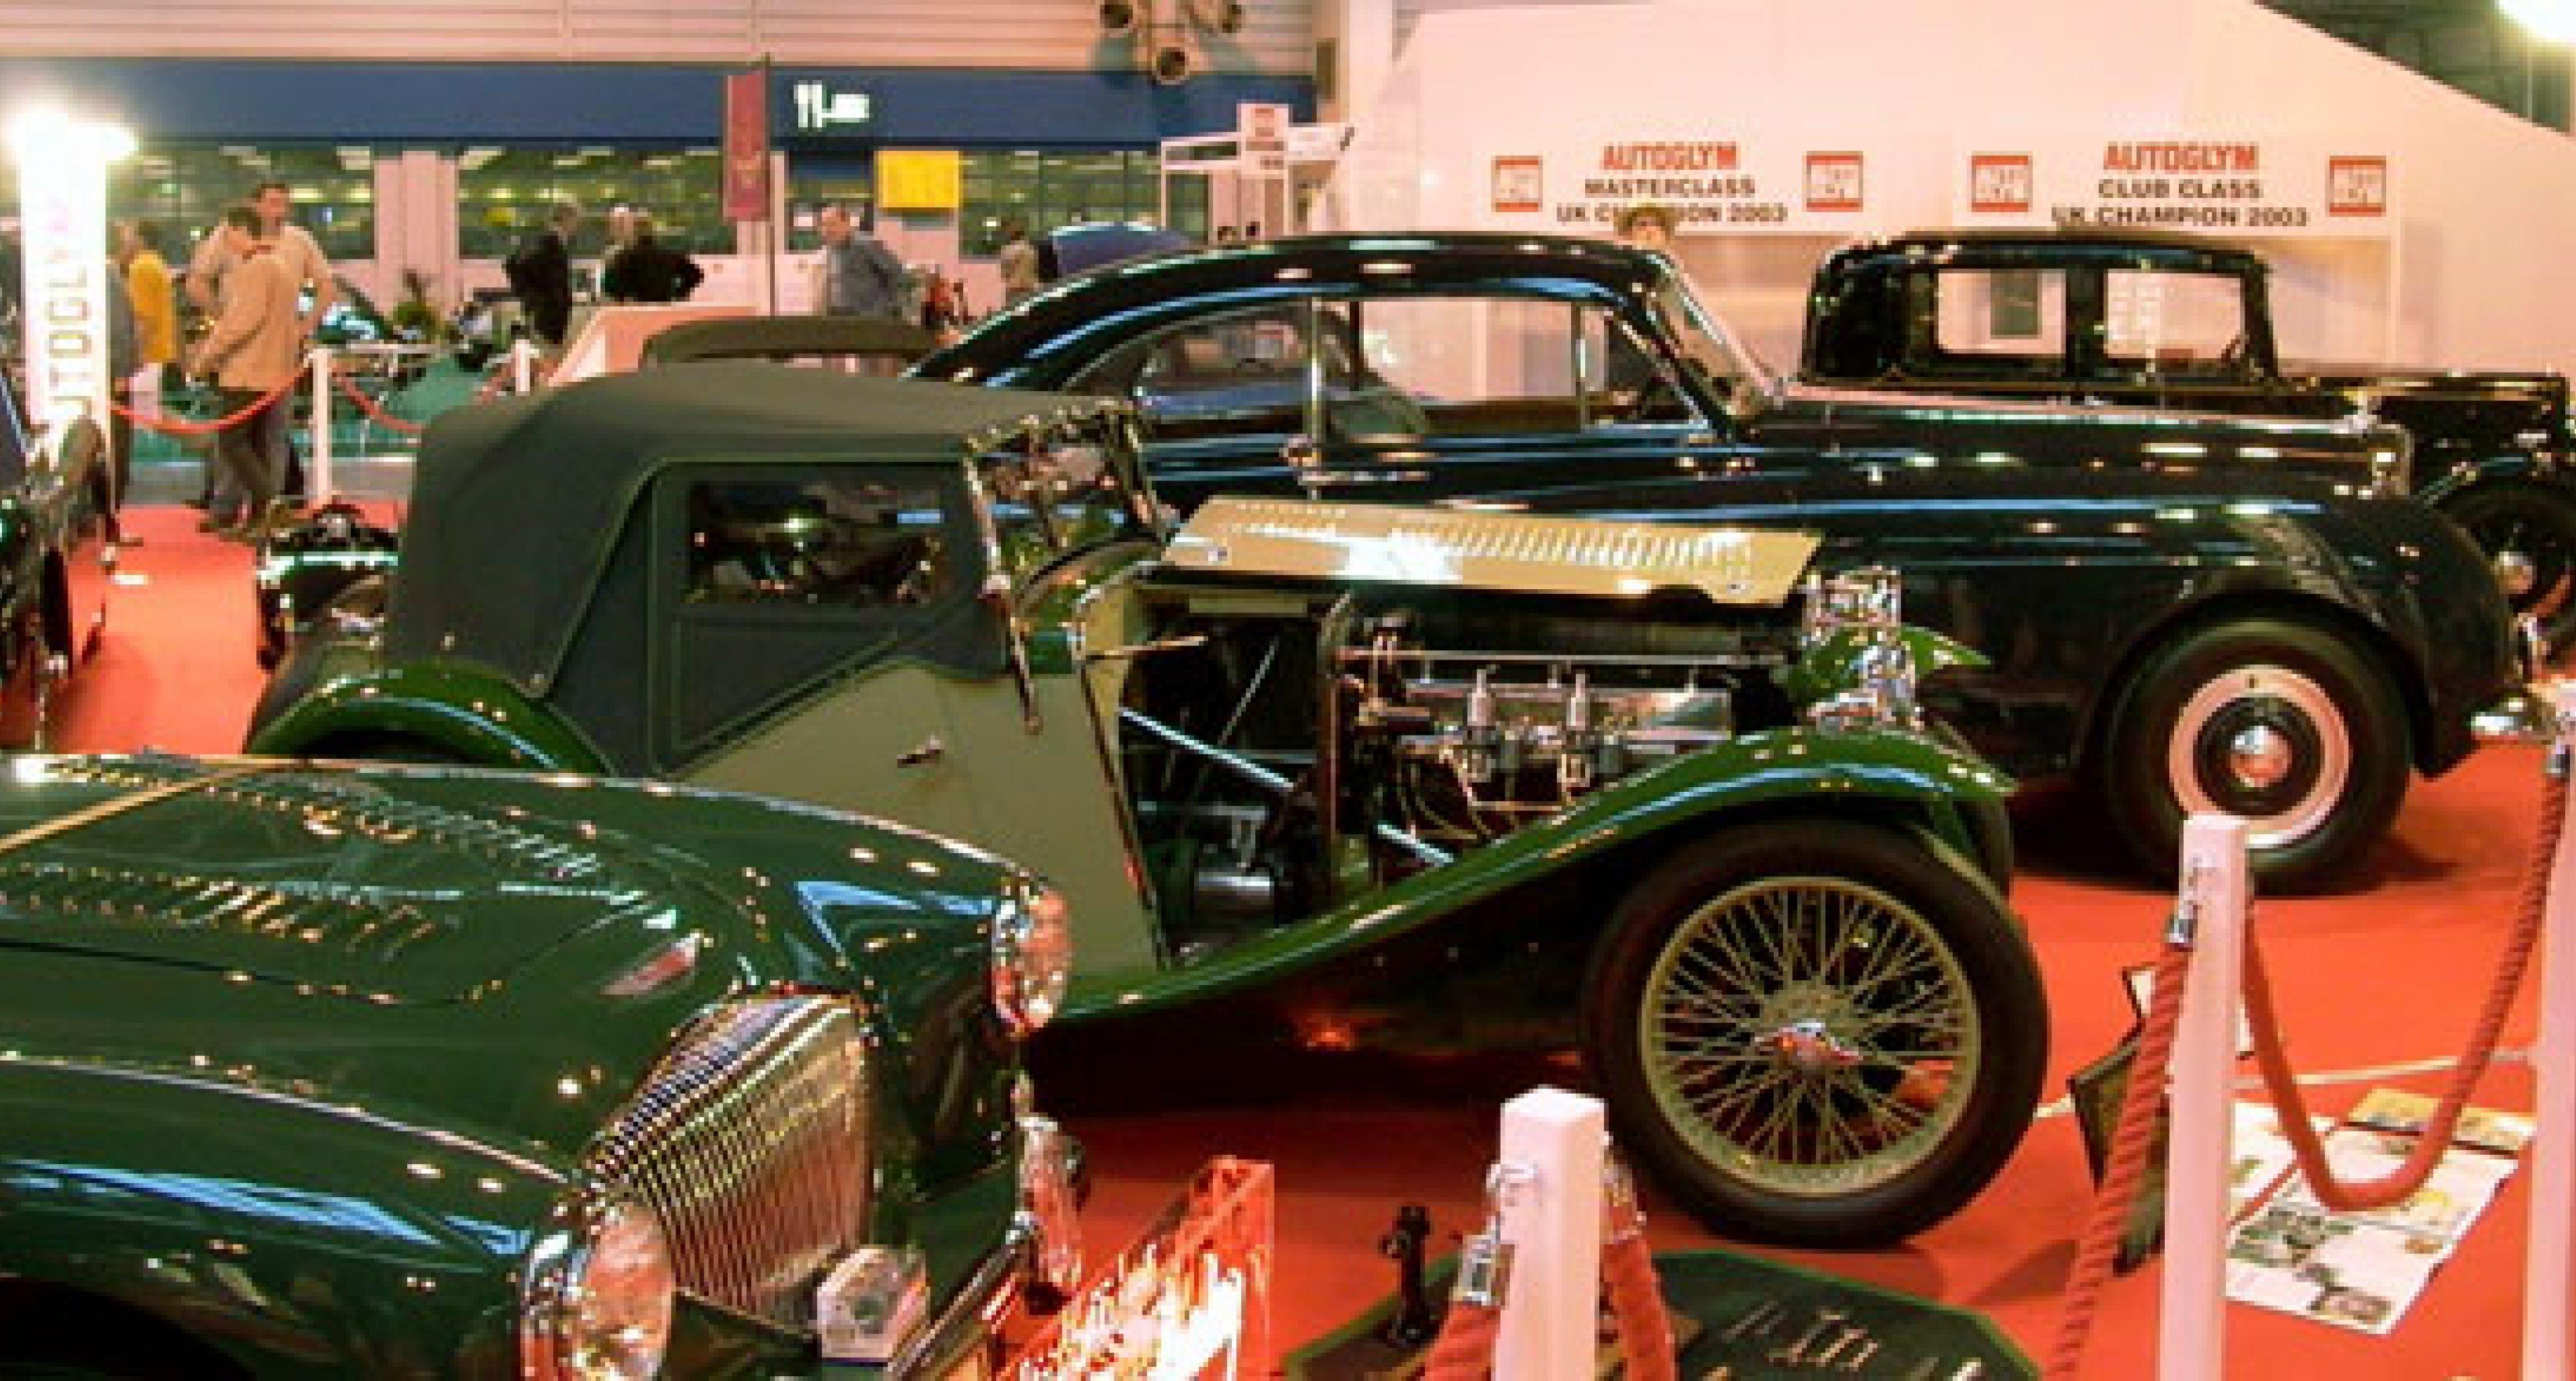 International Classic Motor Show 2003, NEC UK - Review